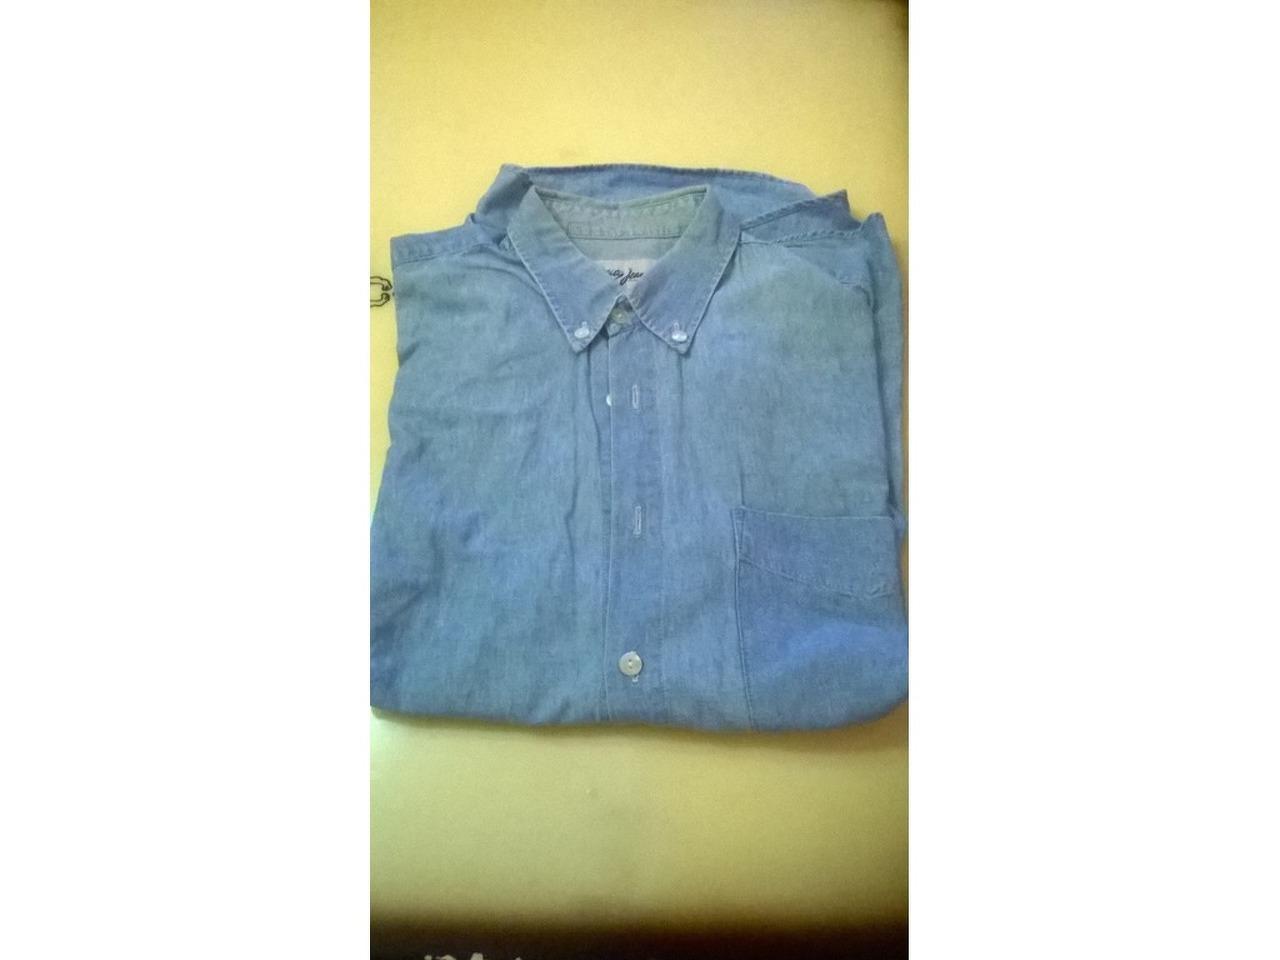 Camisas Barred's, G.Coast, C.Jeans, Cayo Largo, LOGG, N.Corrêa, etc - 1/8